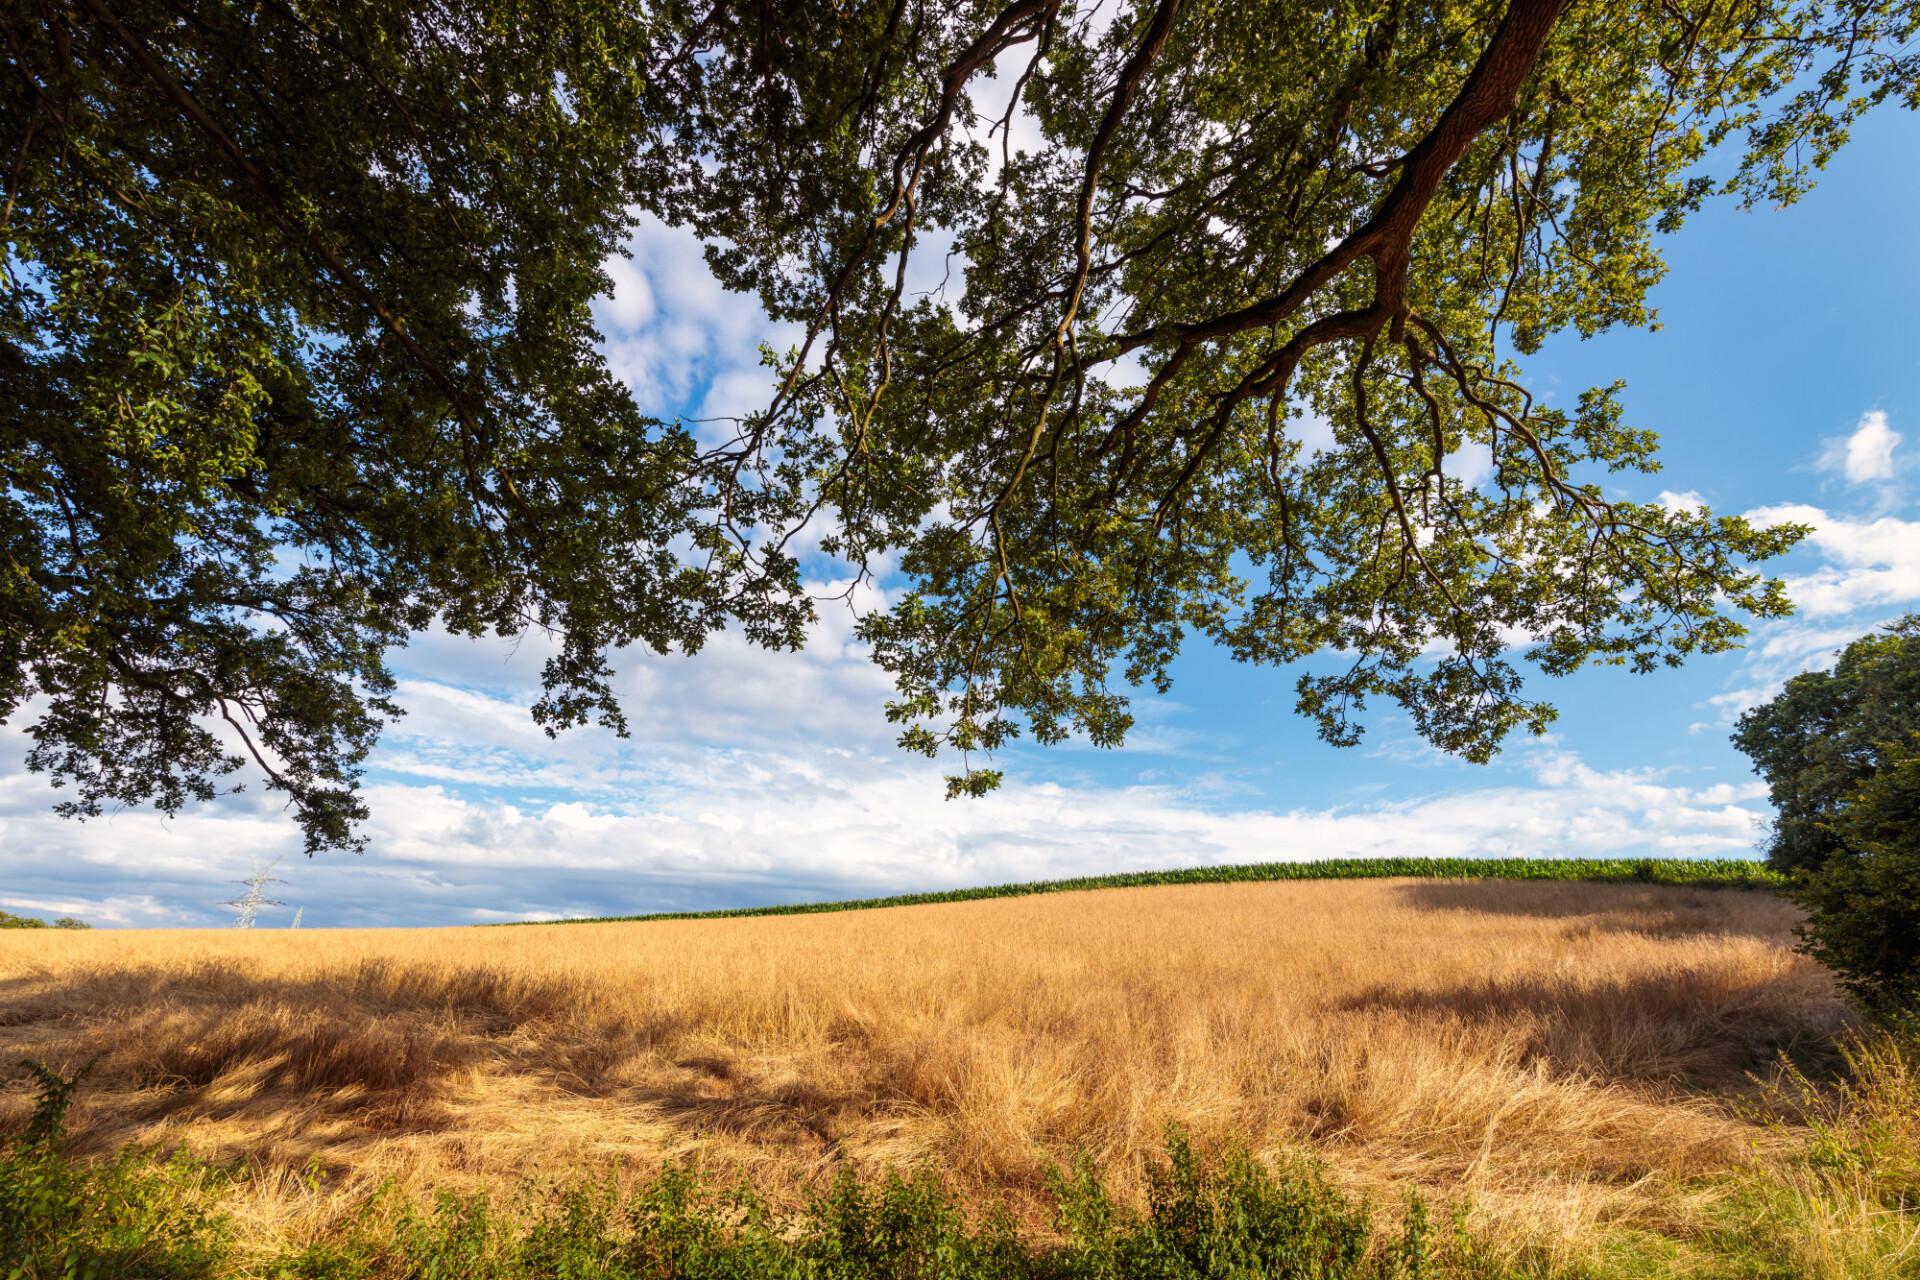 Beautiful rural landscape in northern europe